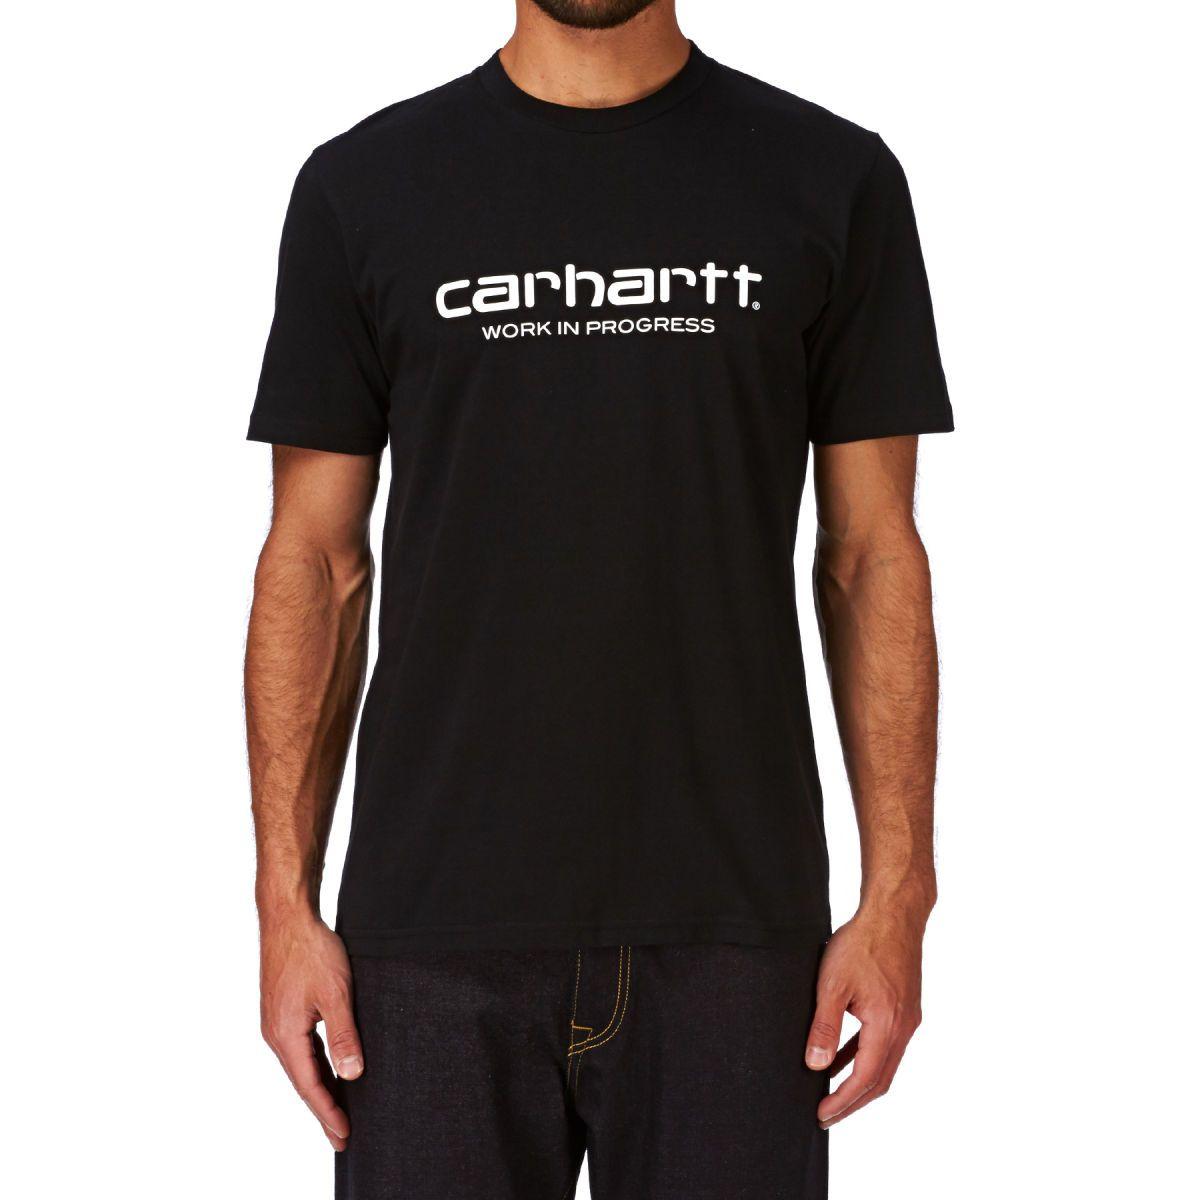 Carhartt Wip Script T-shirt - Black/white